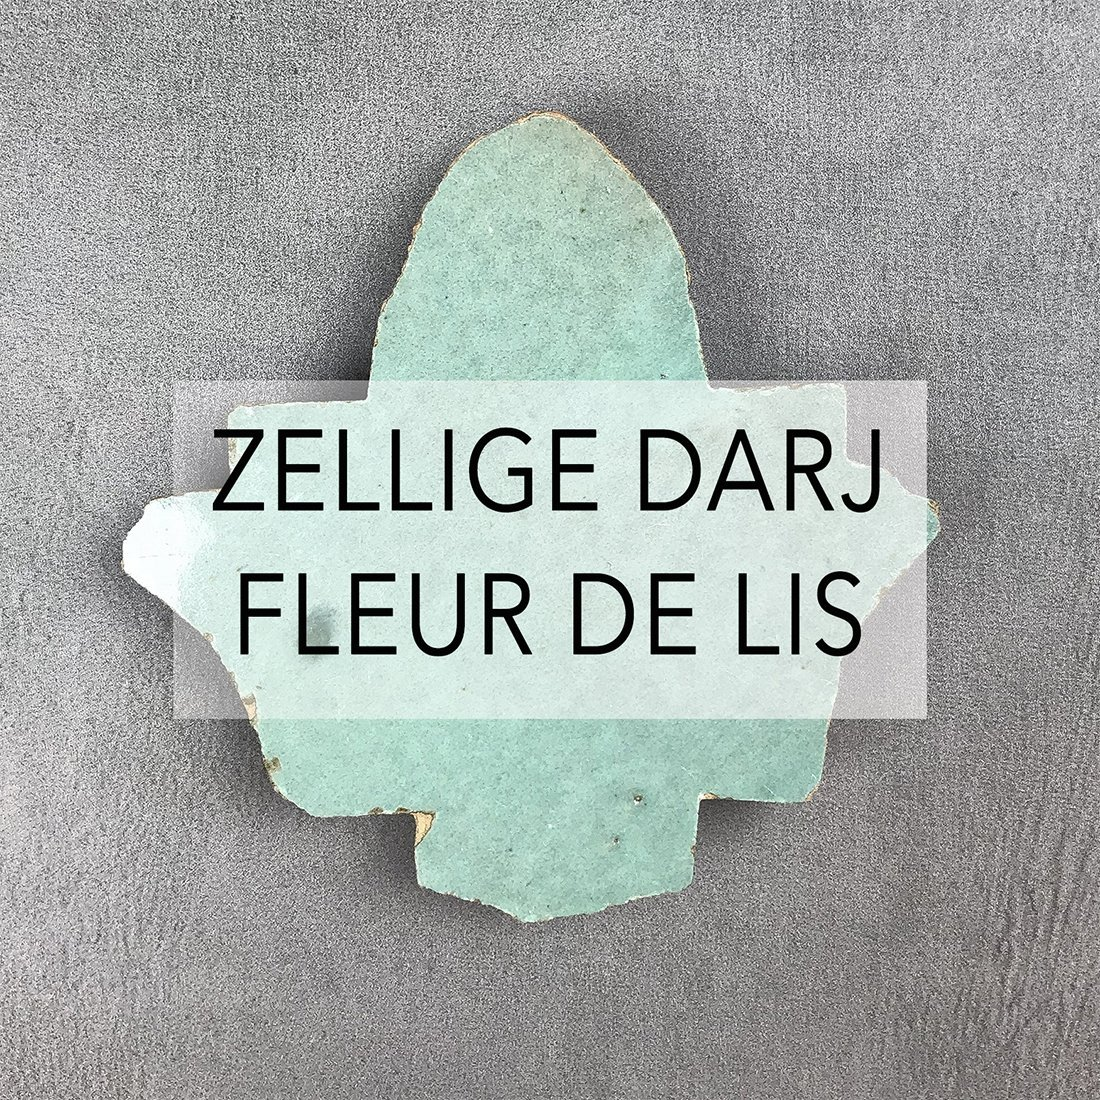 Zellige Darj Fleur De Lis tiles